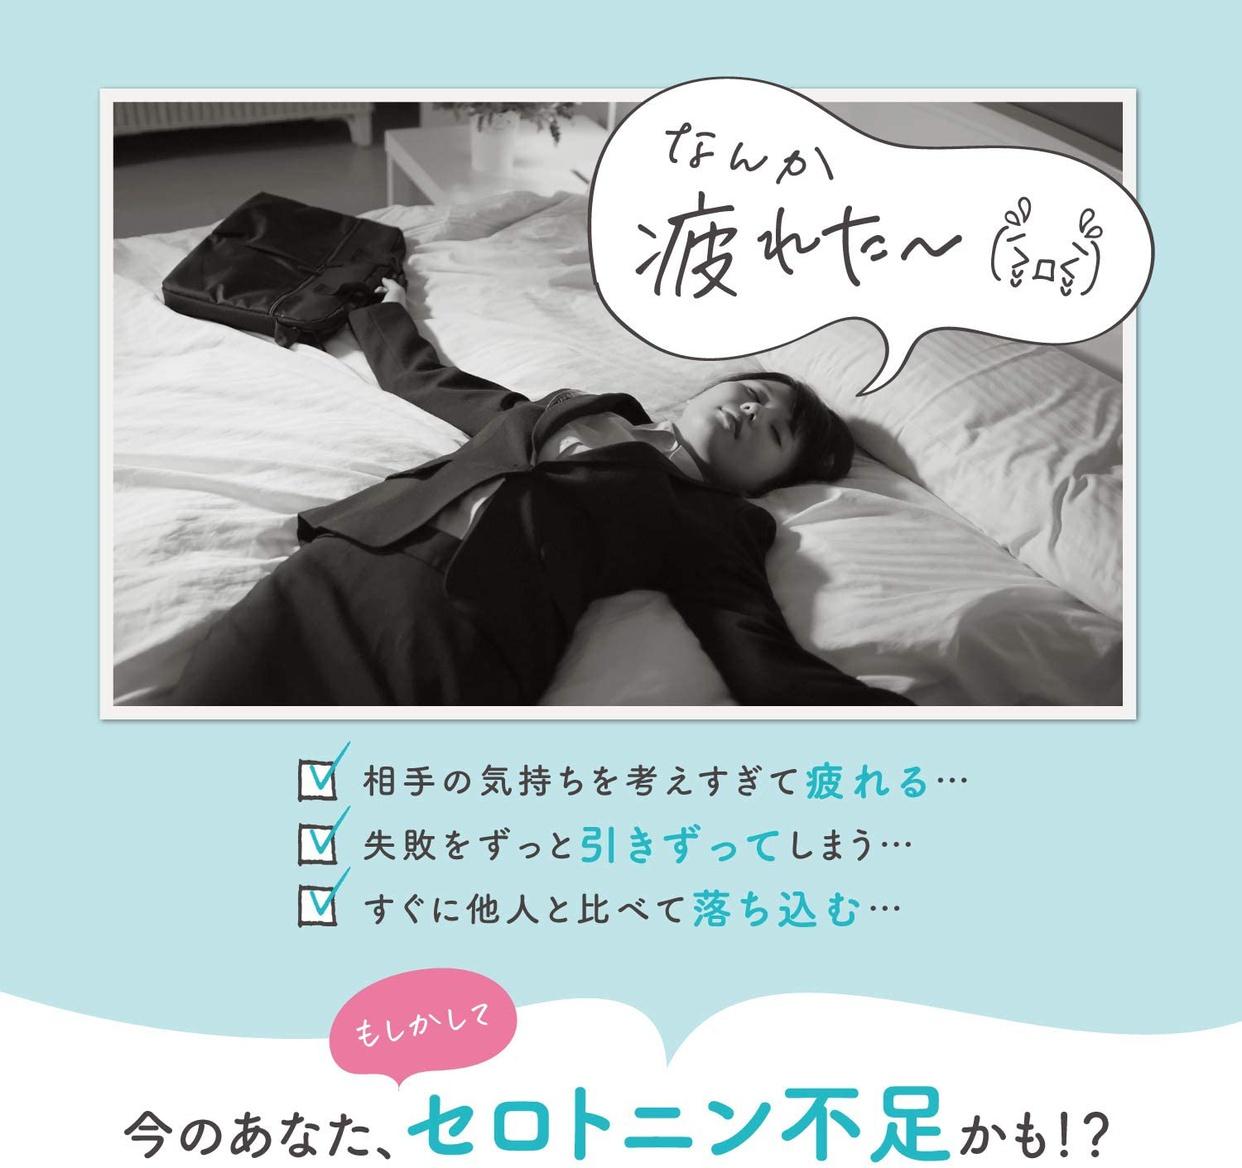 MBI(エムビーアイ) 休息時間の商品画像3